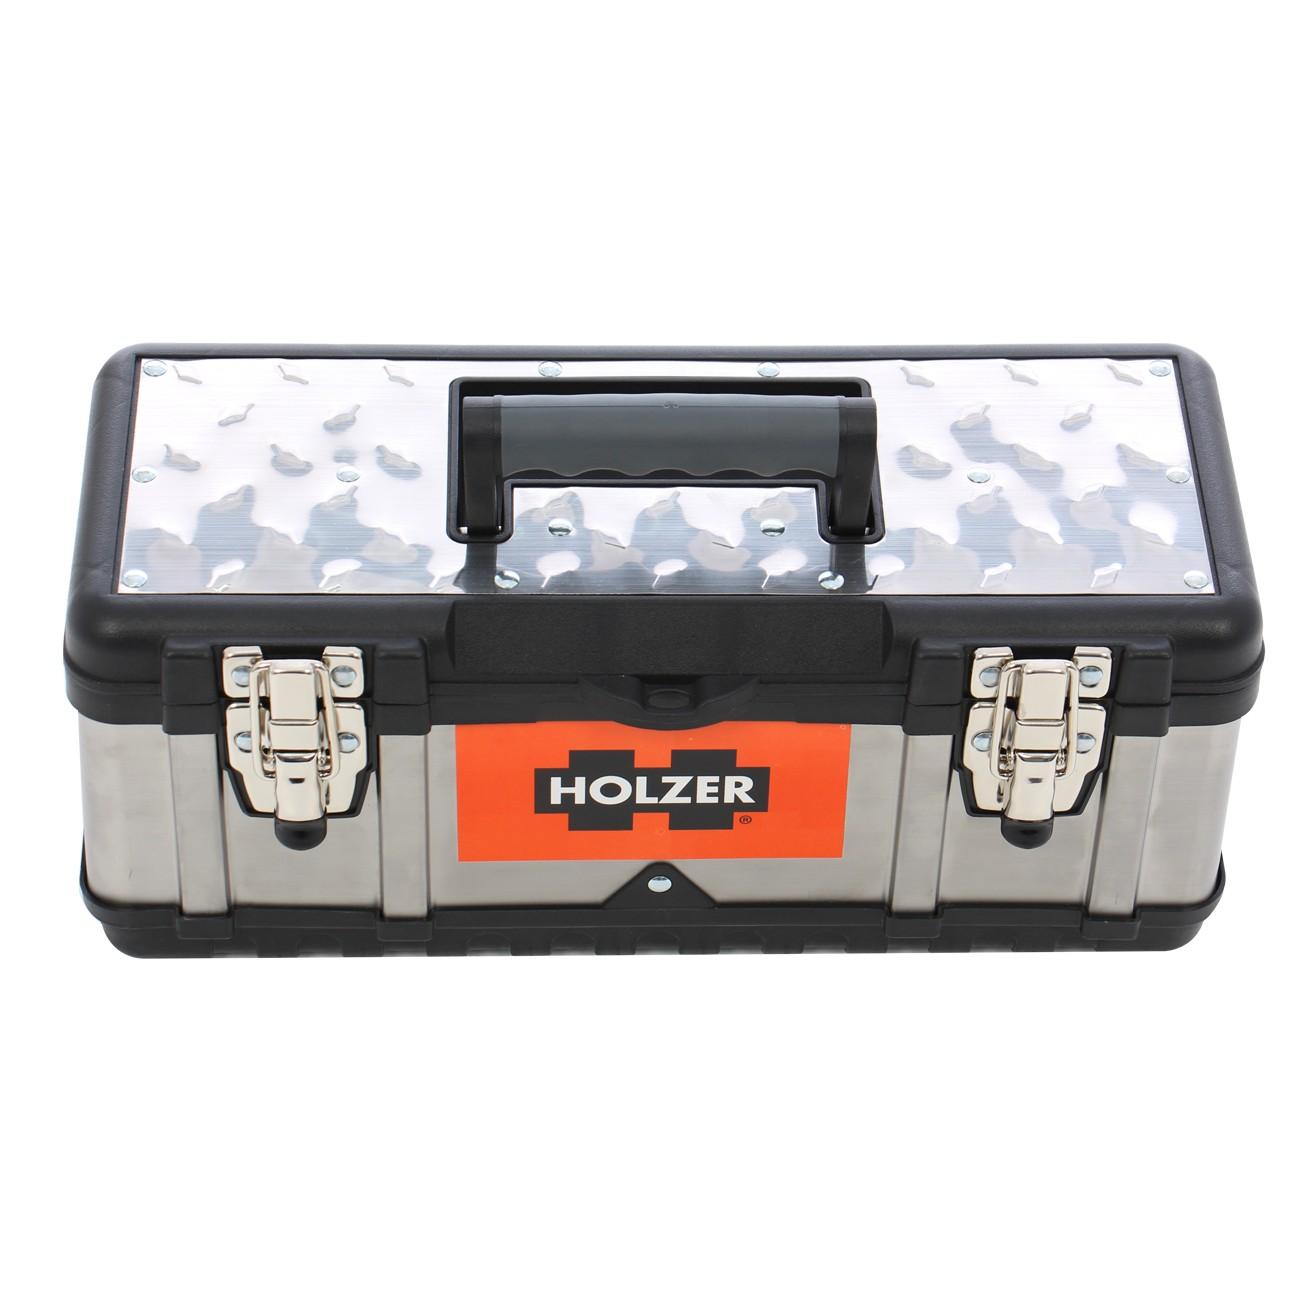 Cutie metalica pentru scule, Holzer PT14099-1, 390 x 180 x 170 mm